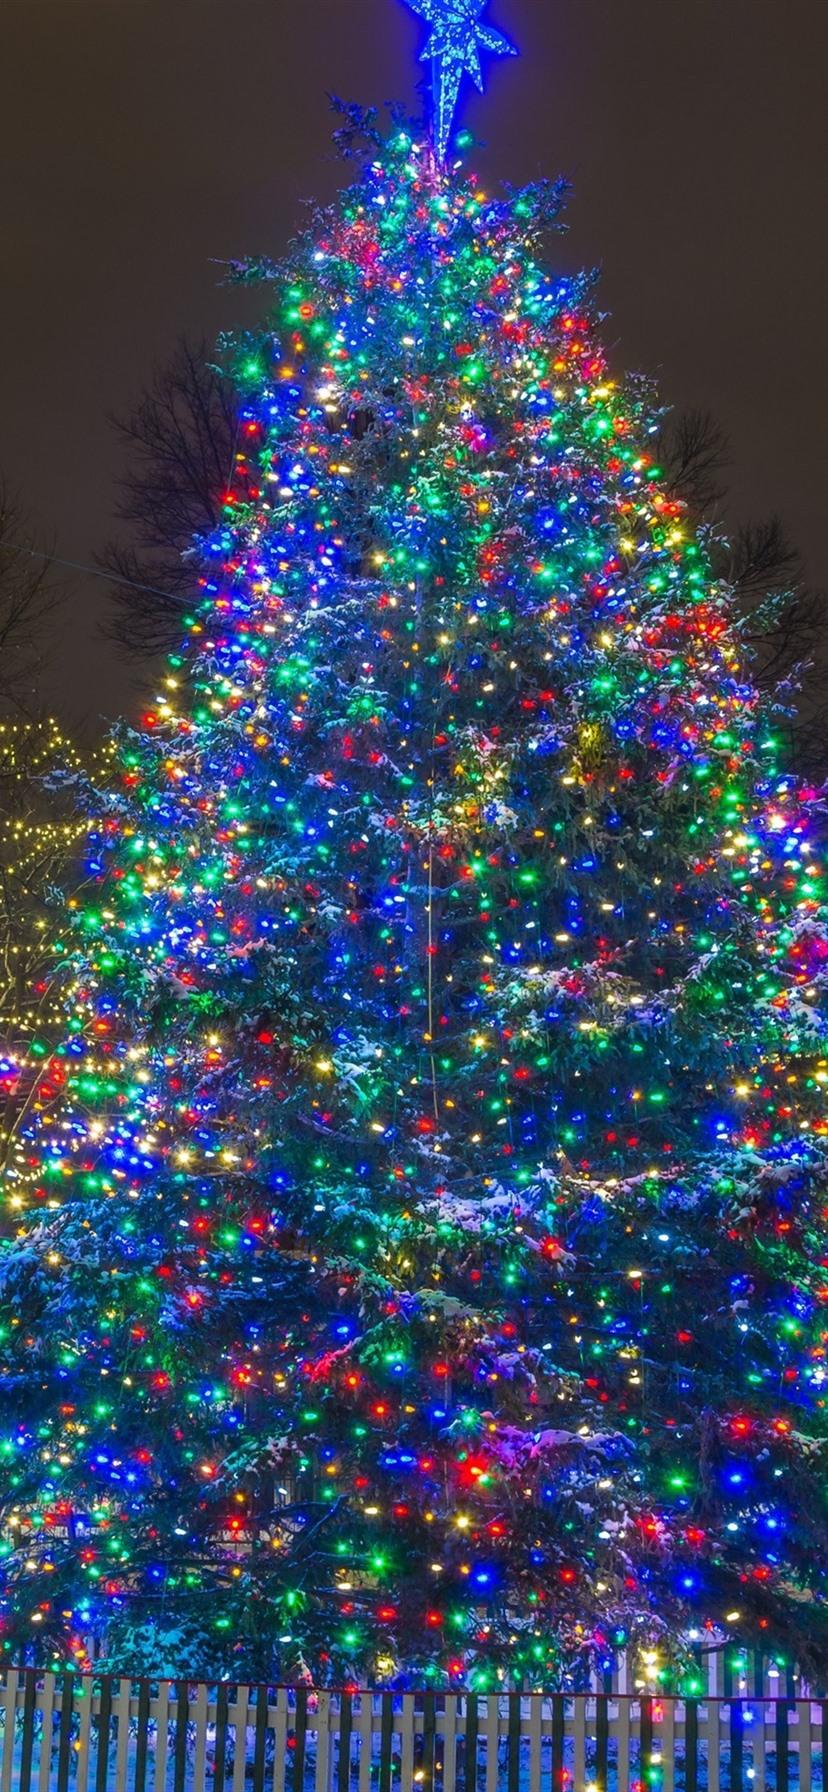 New Year, Christmas tree, lights, night, winter, snow, city